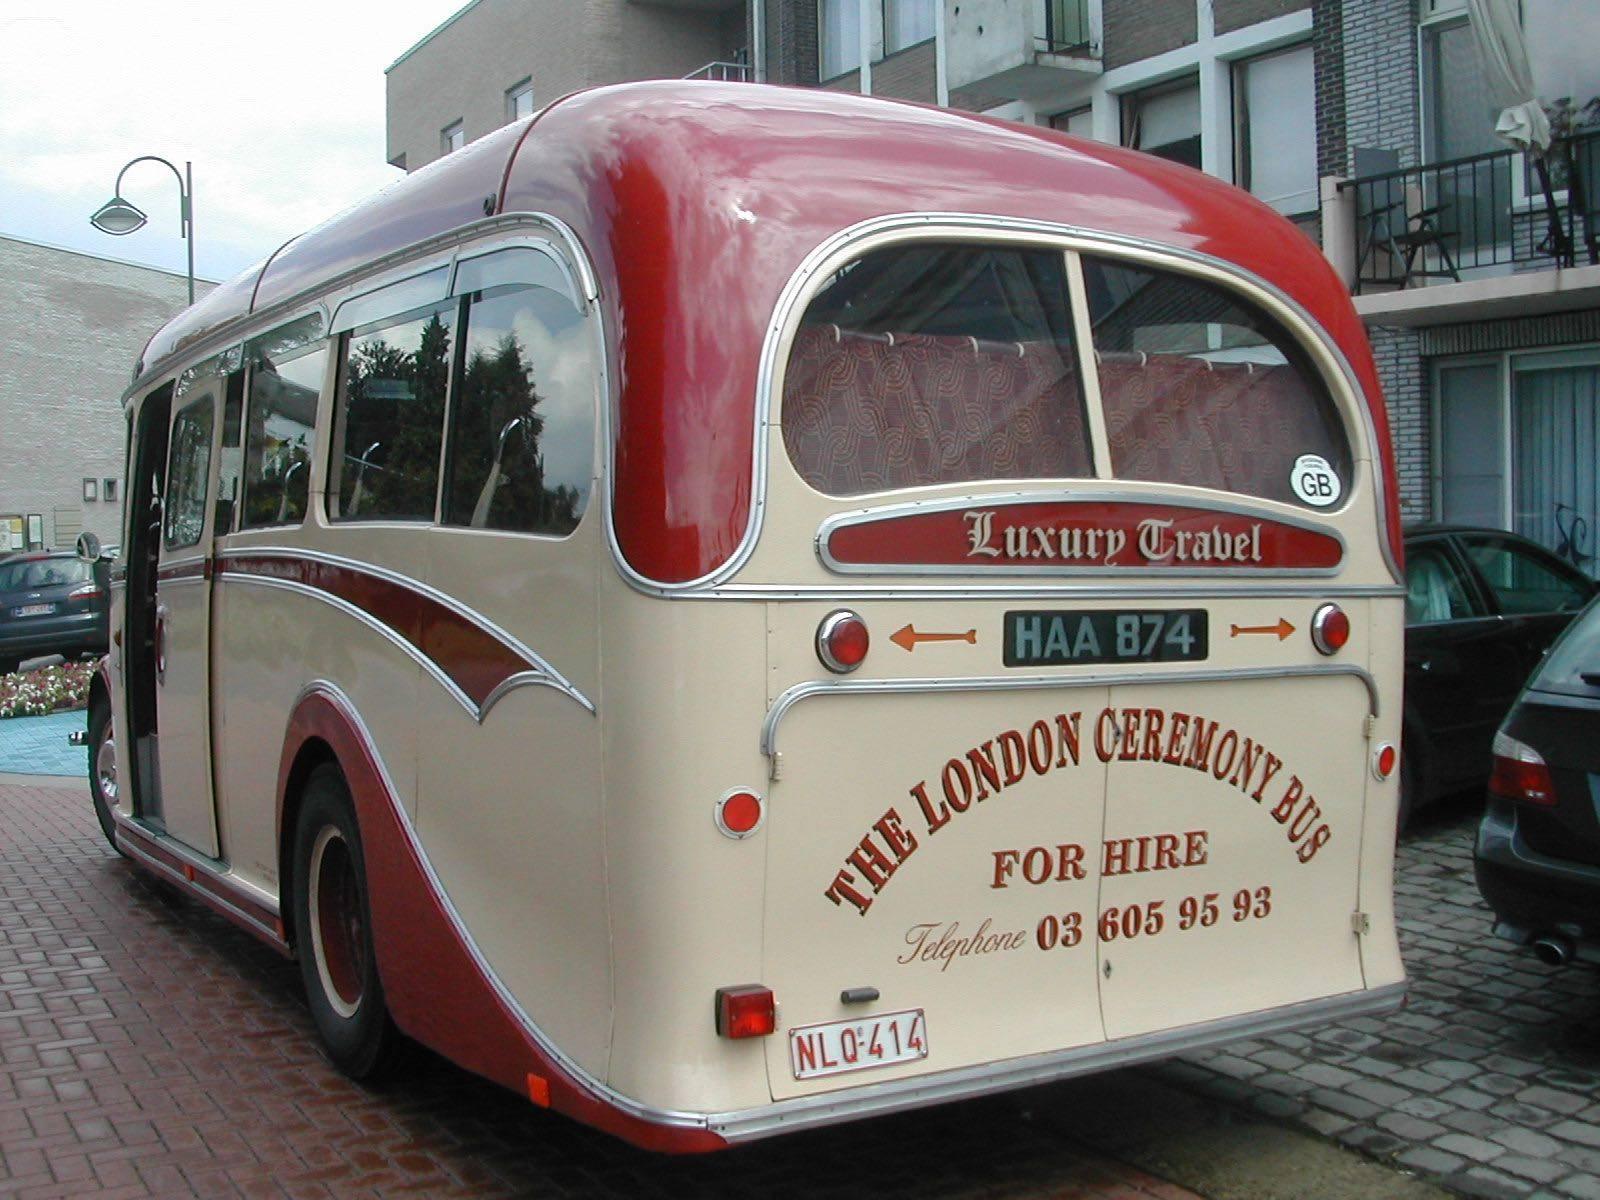 The London Ceremony Bus - Trouwvervoer - Ceremonievervoer - Bus - House of Weddings - 12